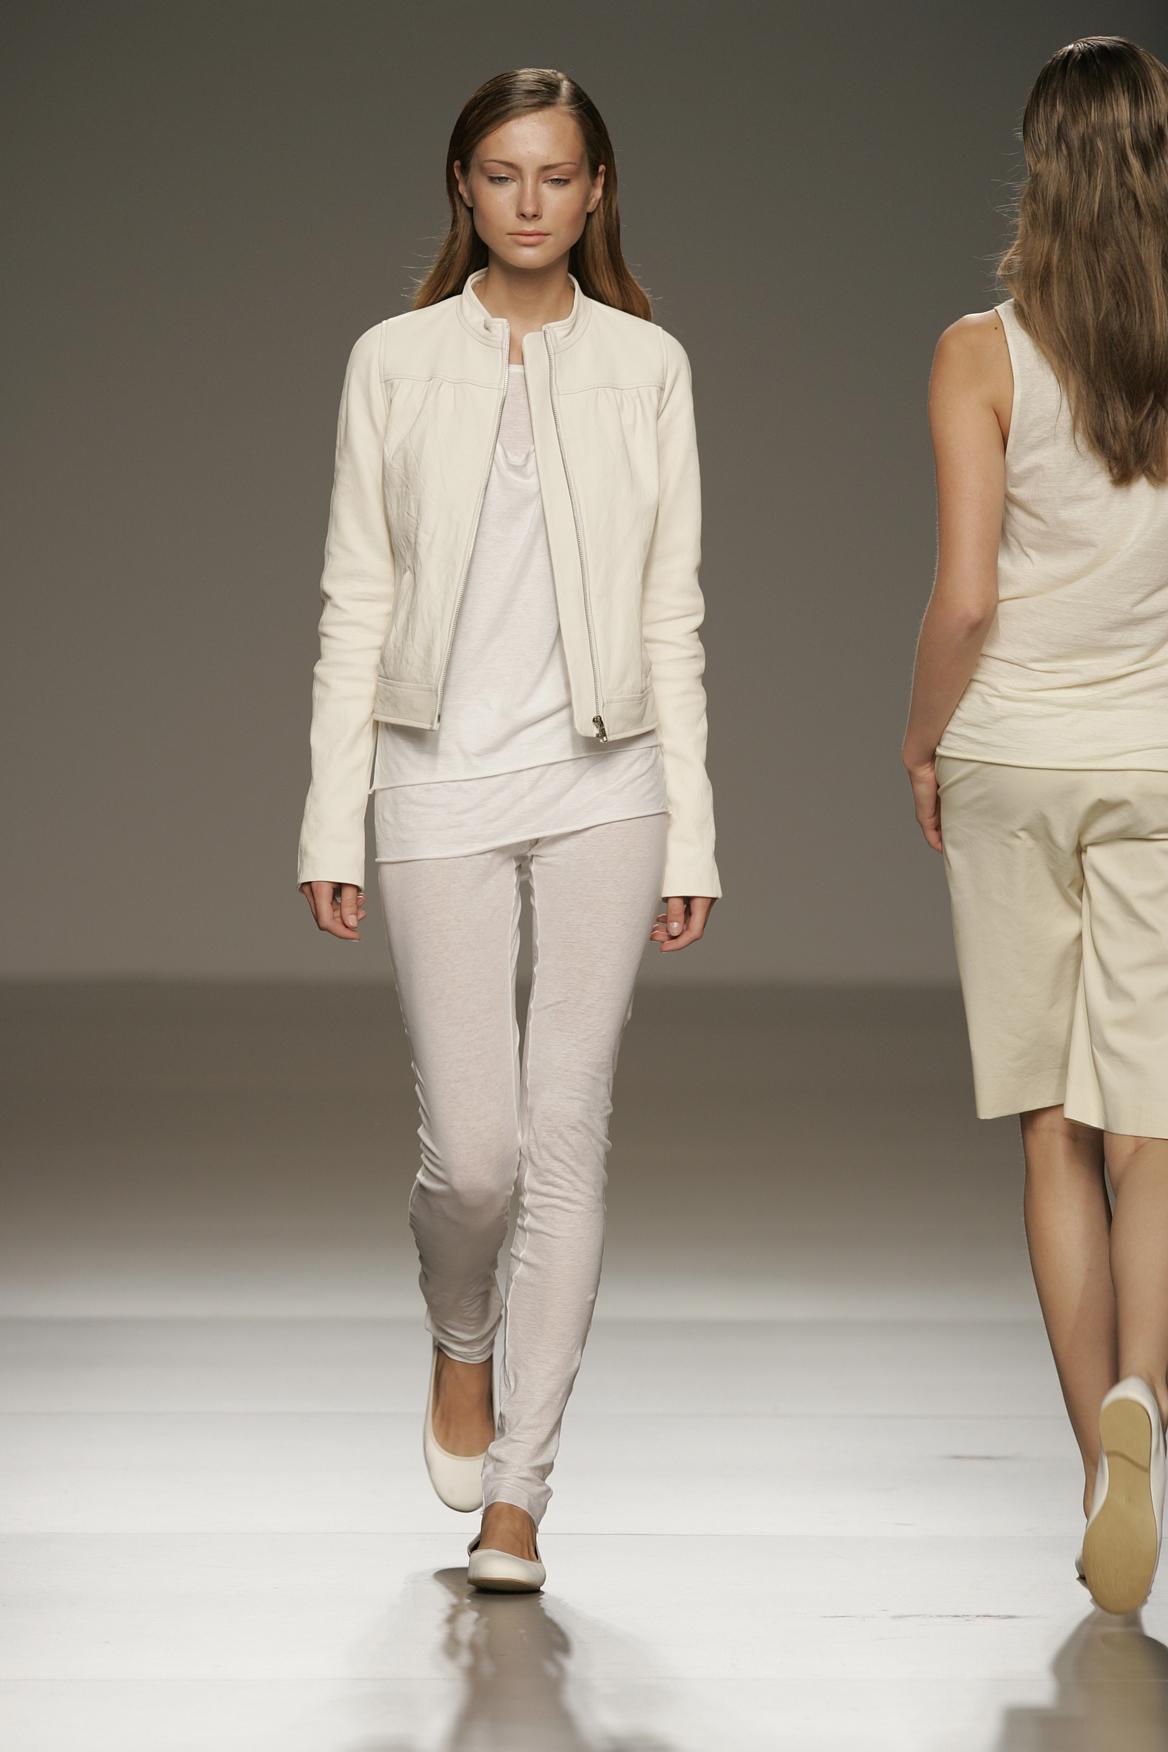 moda-espanola-evolucion-textil-ton-pernas Moda española: La evolución del sector textil en 42 años